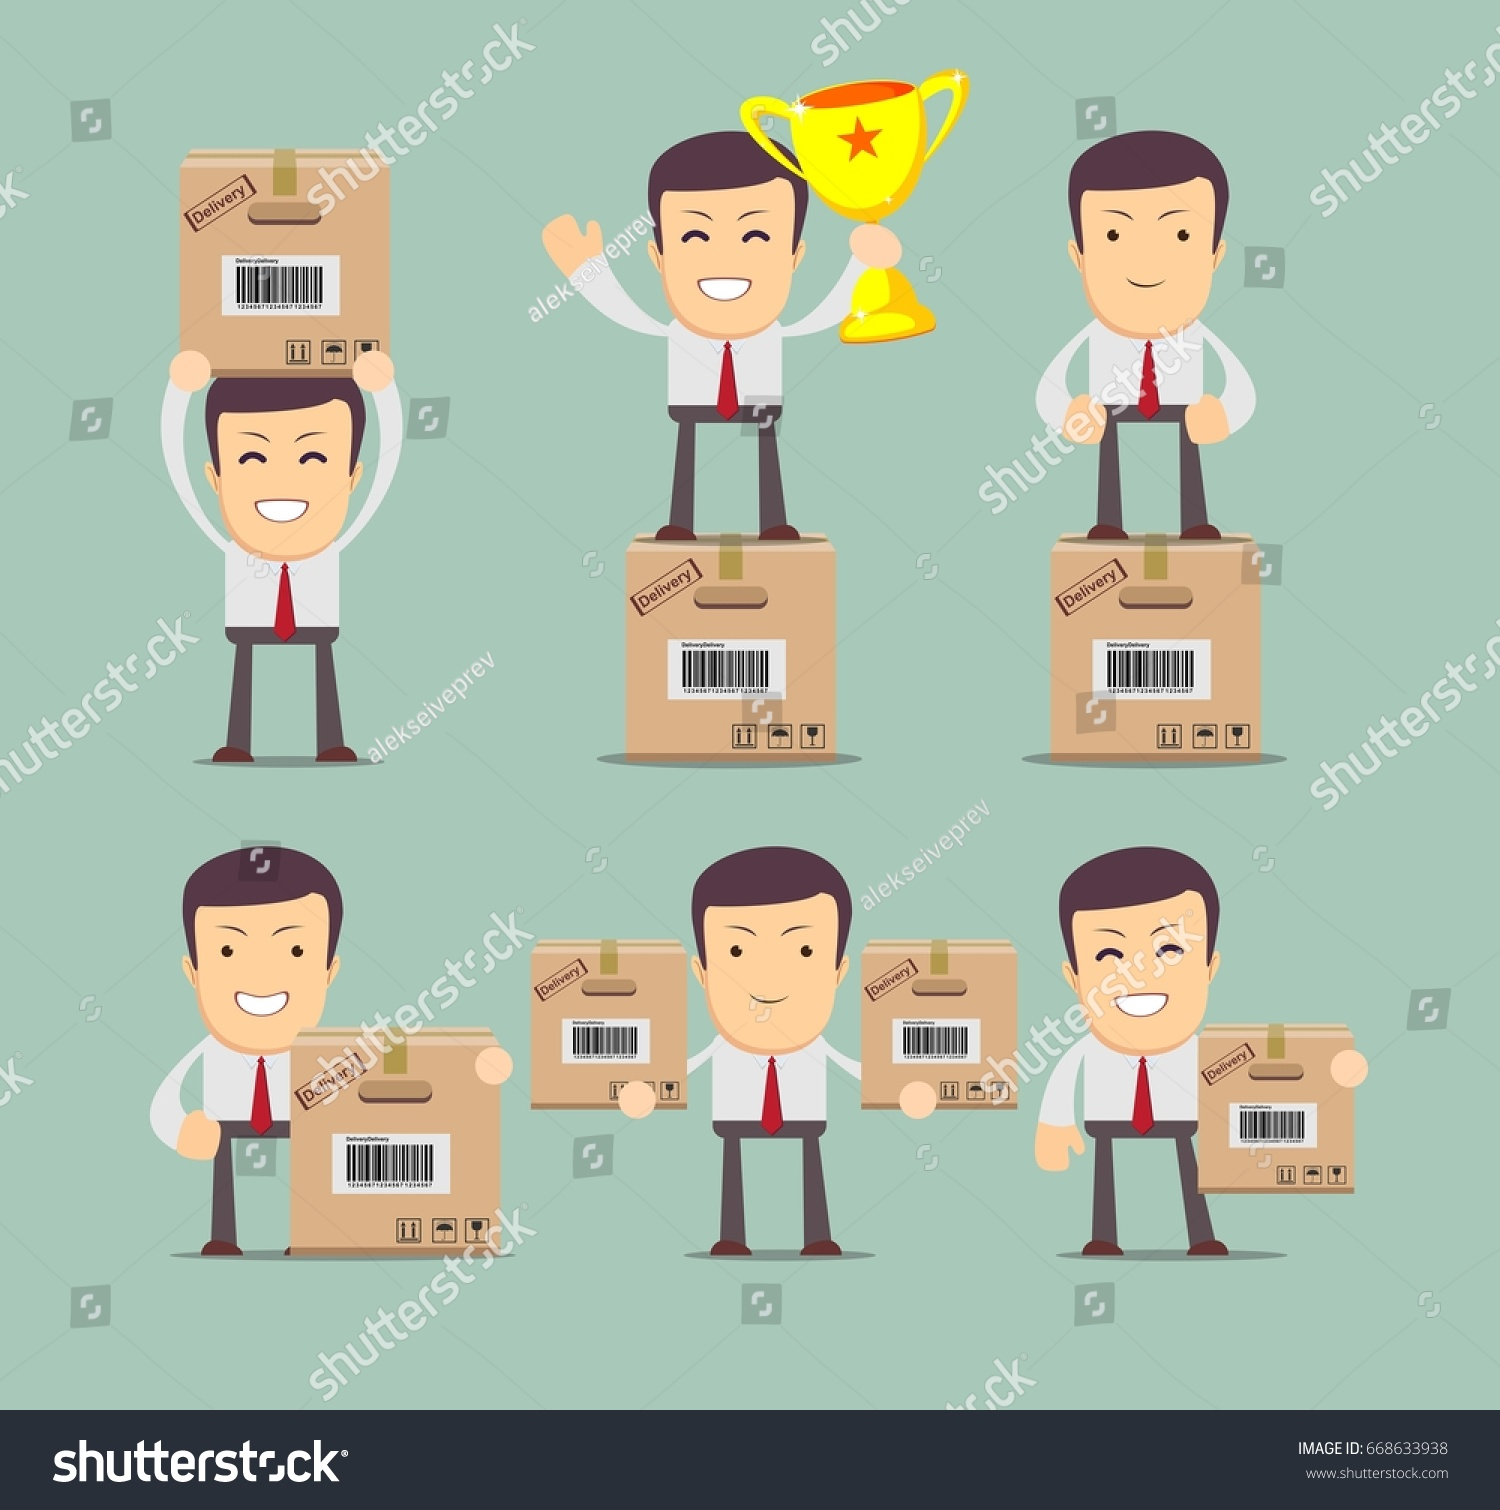 Set delivery service man box stock stock illustration 668633938 set delivery service man box stock stock illustration 668633938 shutterstock m4hsunfo